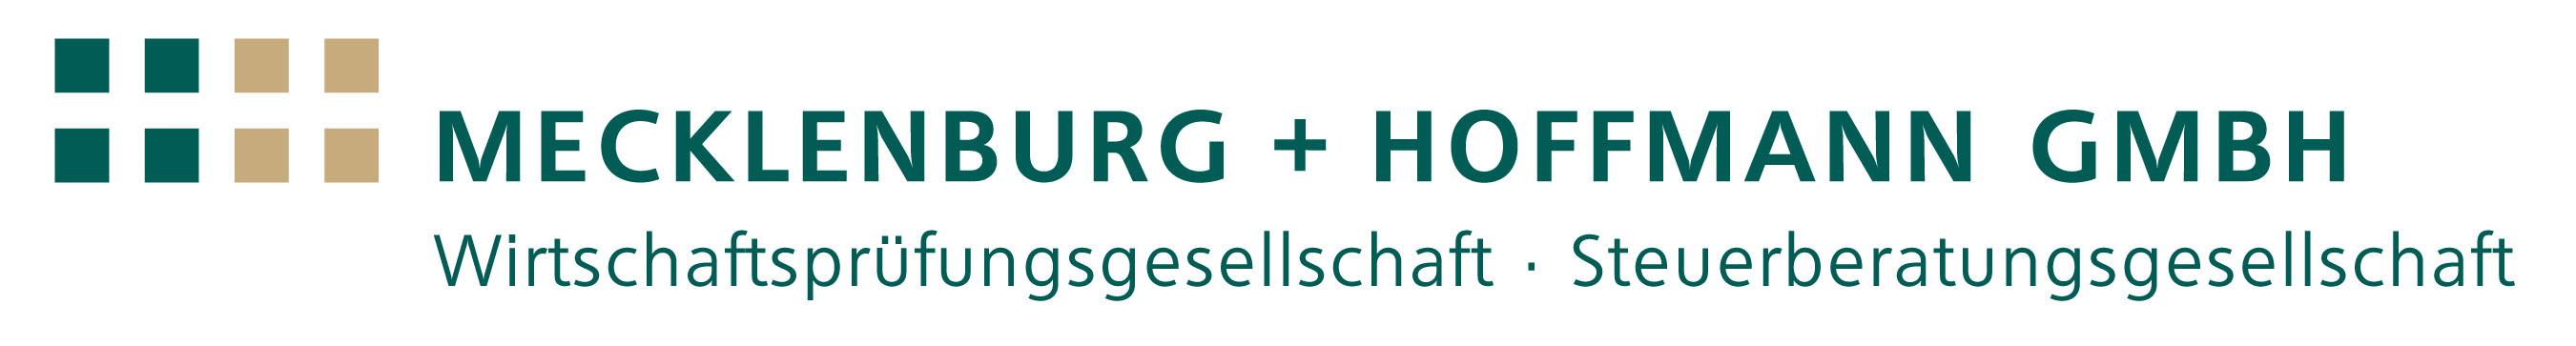 Logo Mecklenburg & Hoffmann